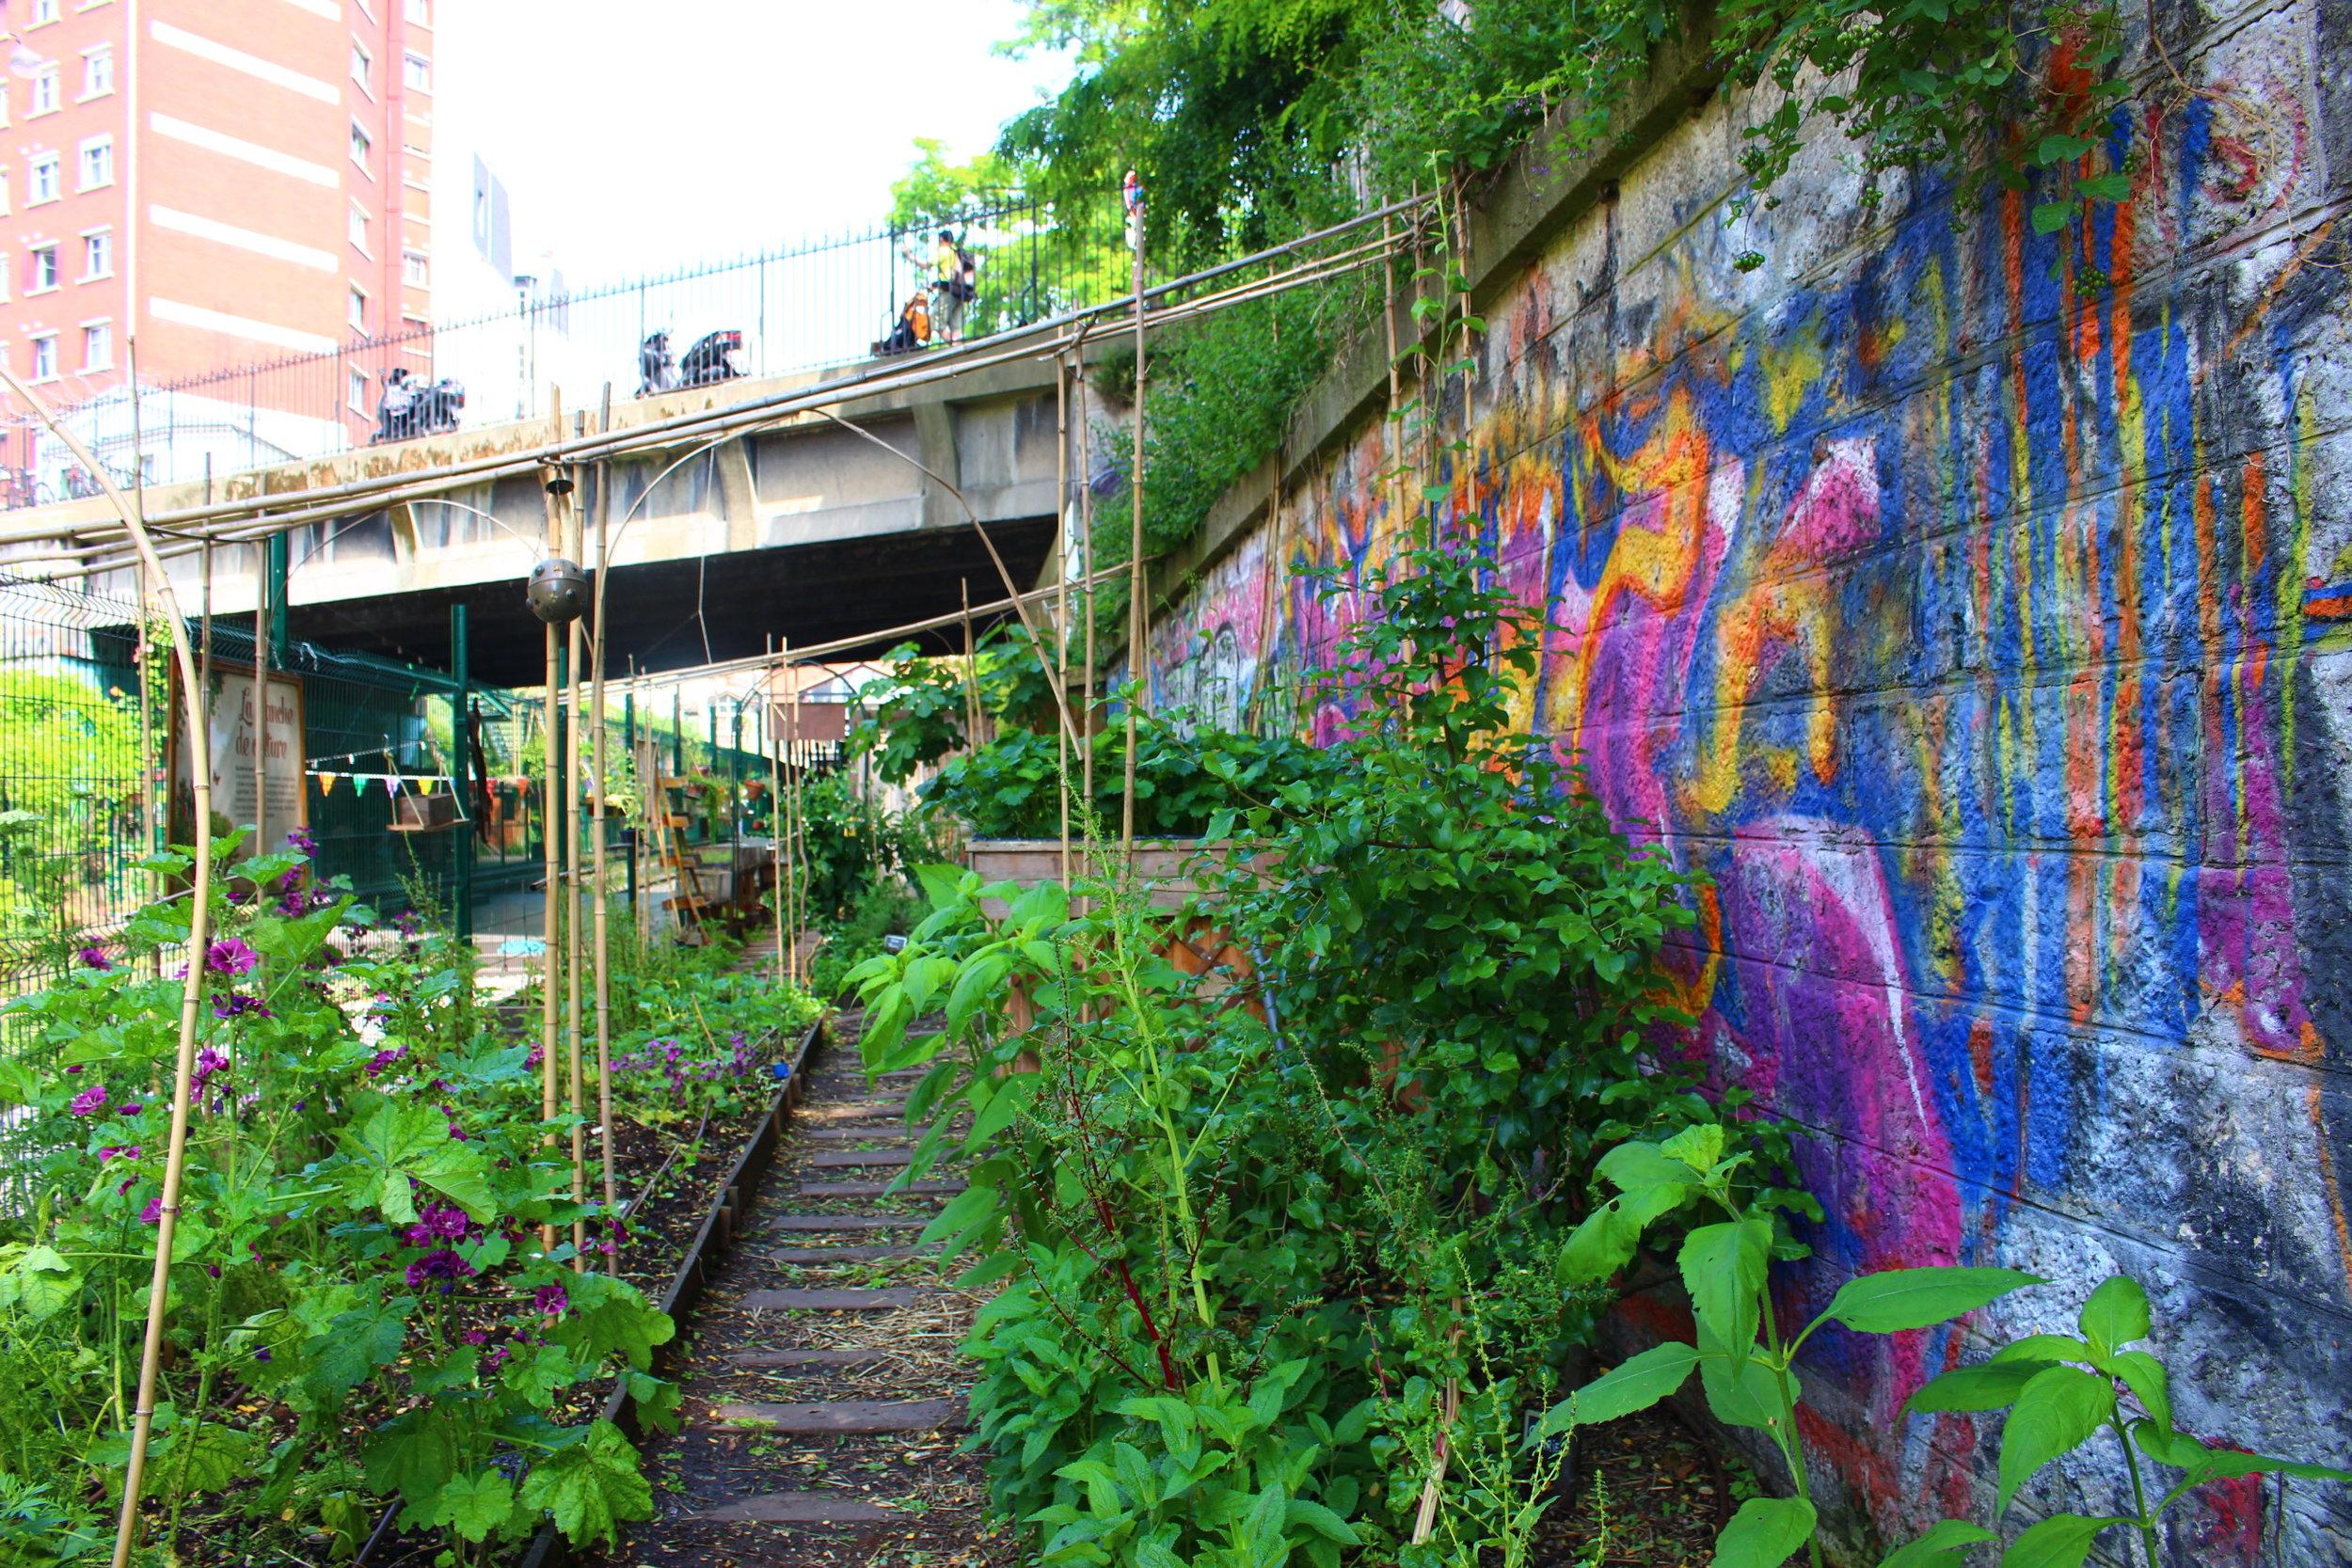 ferme-urbaine-agro-ecologie-paris-18.jpg